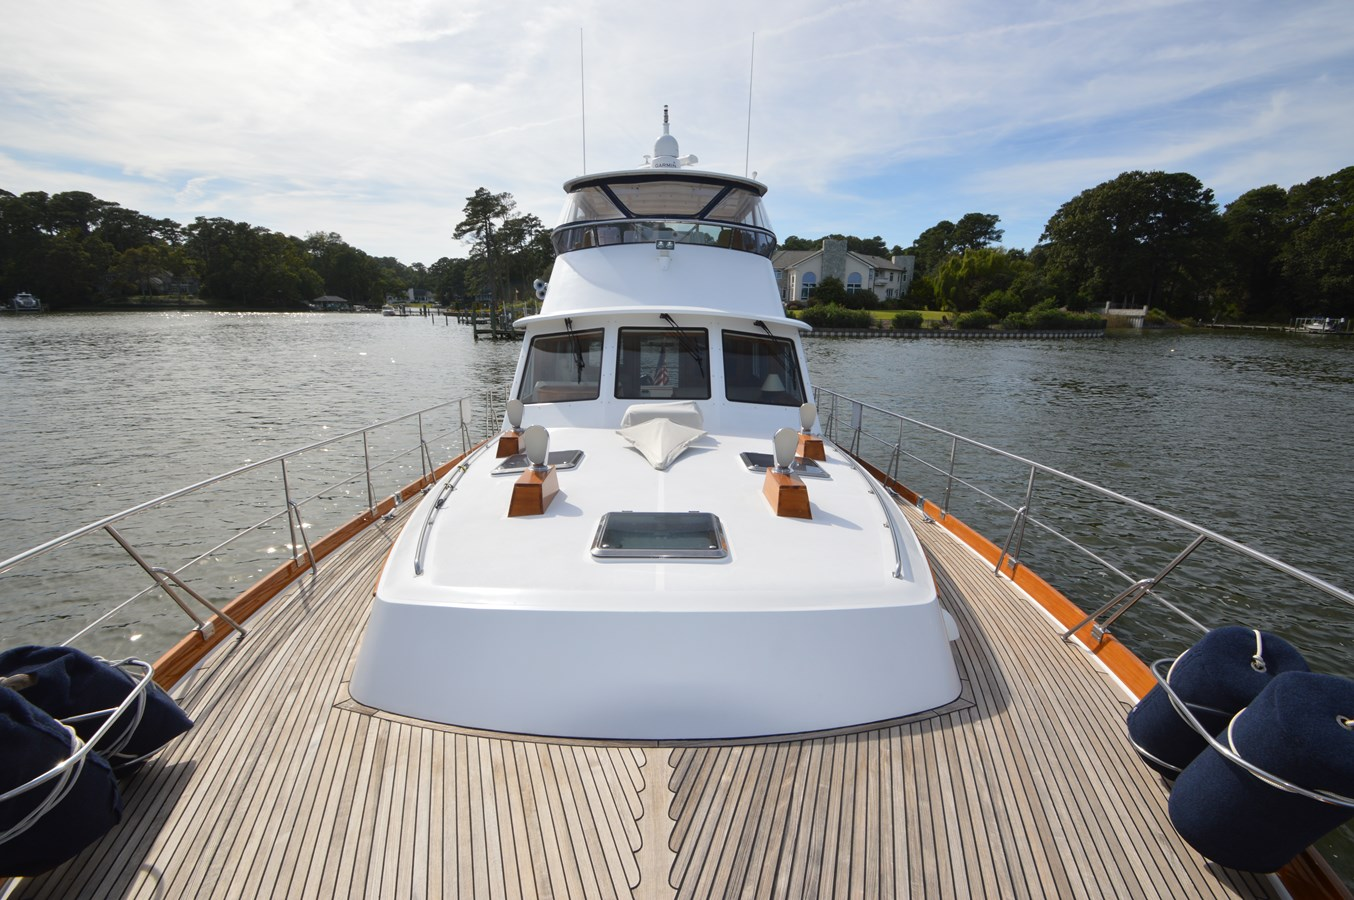 17 2004 GRAND BANKS 58 Eastbay Motor Yacht 2713667